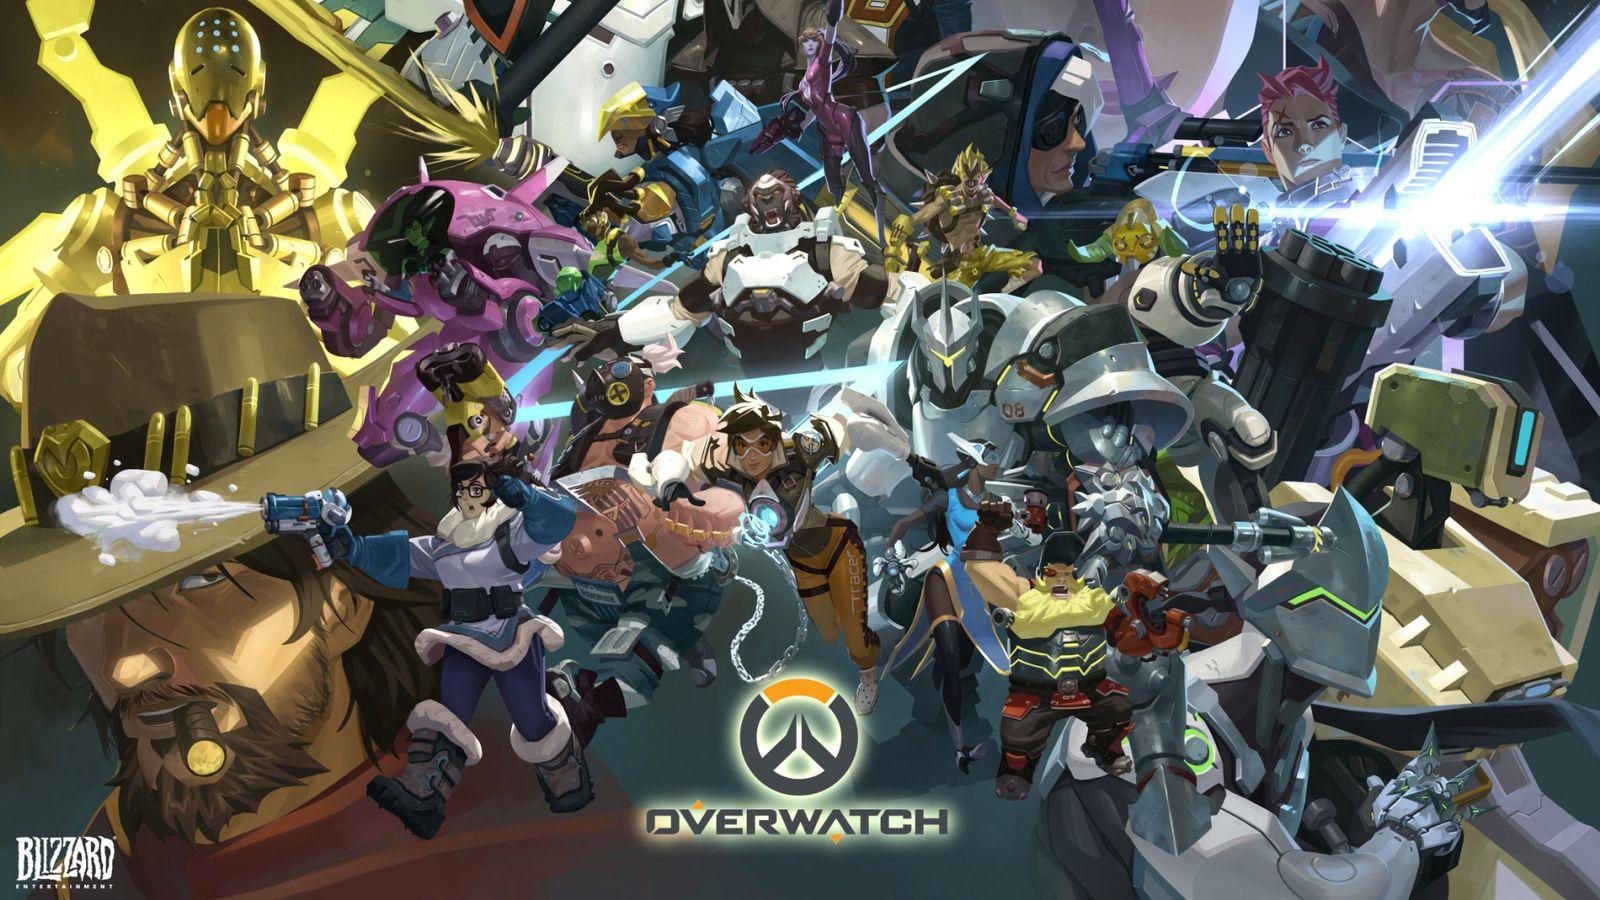 Overwatch Anniversary event kicks off May 23